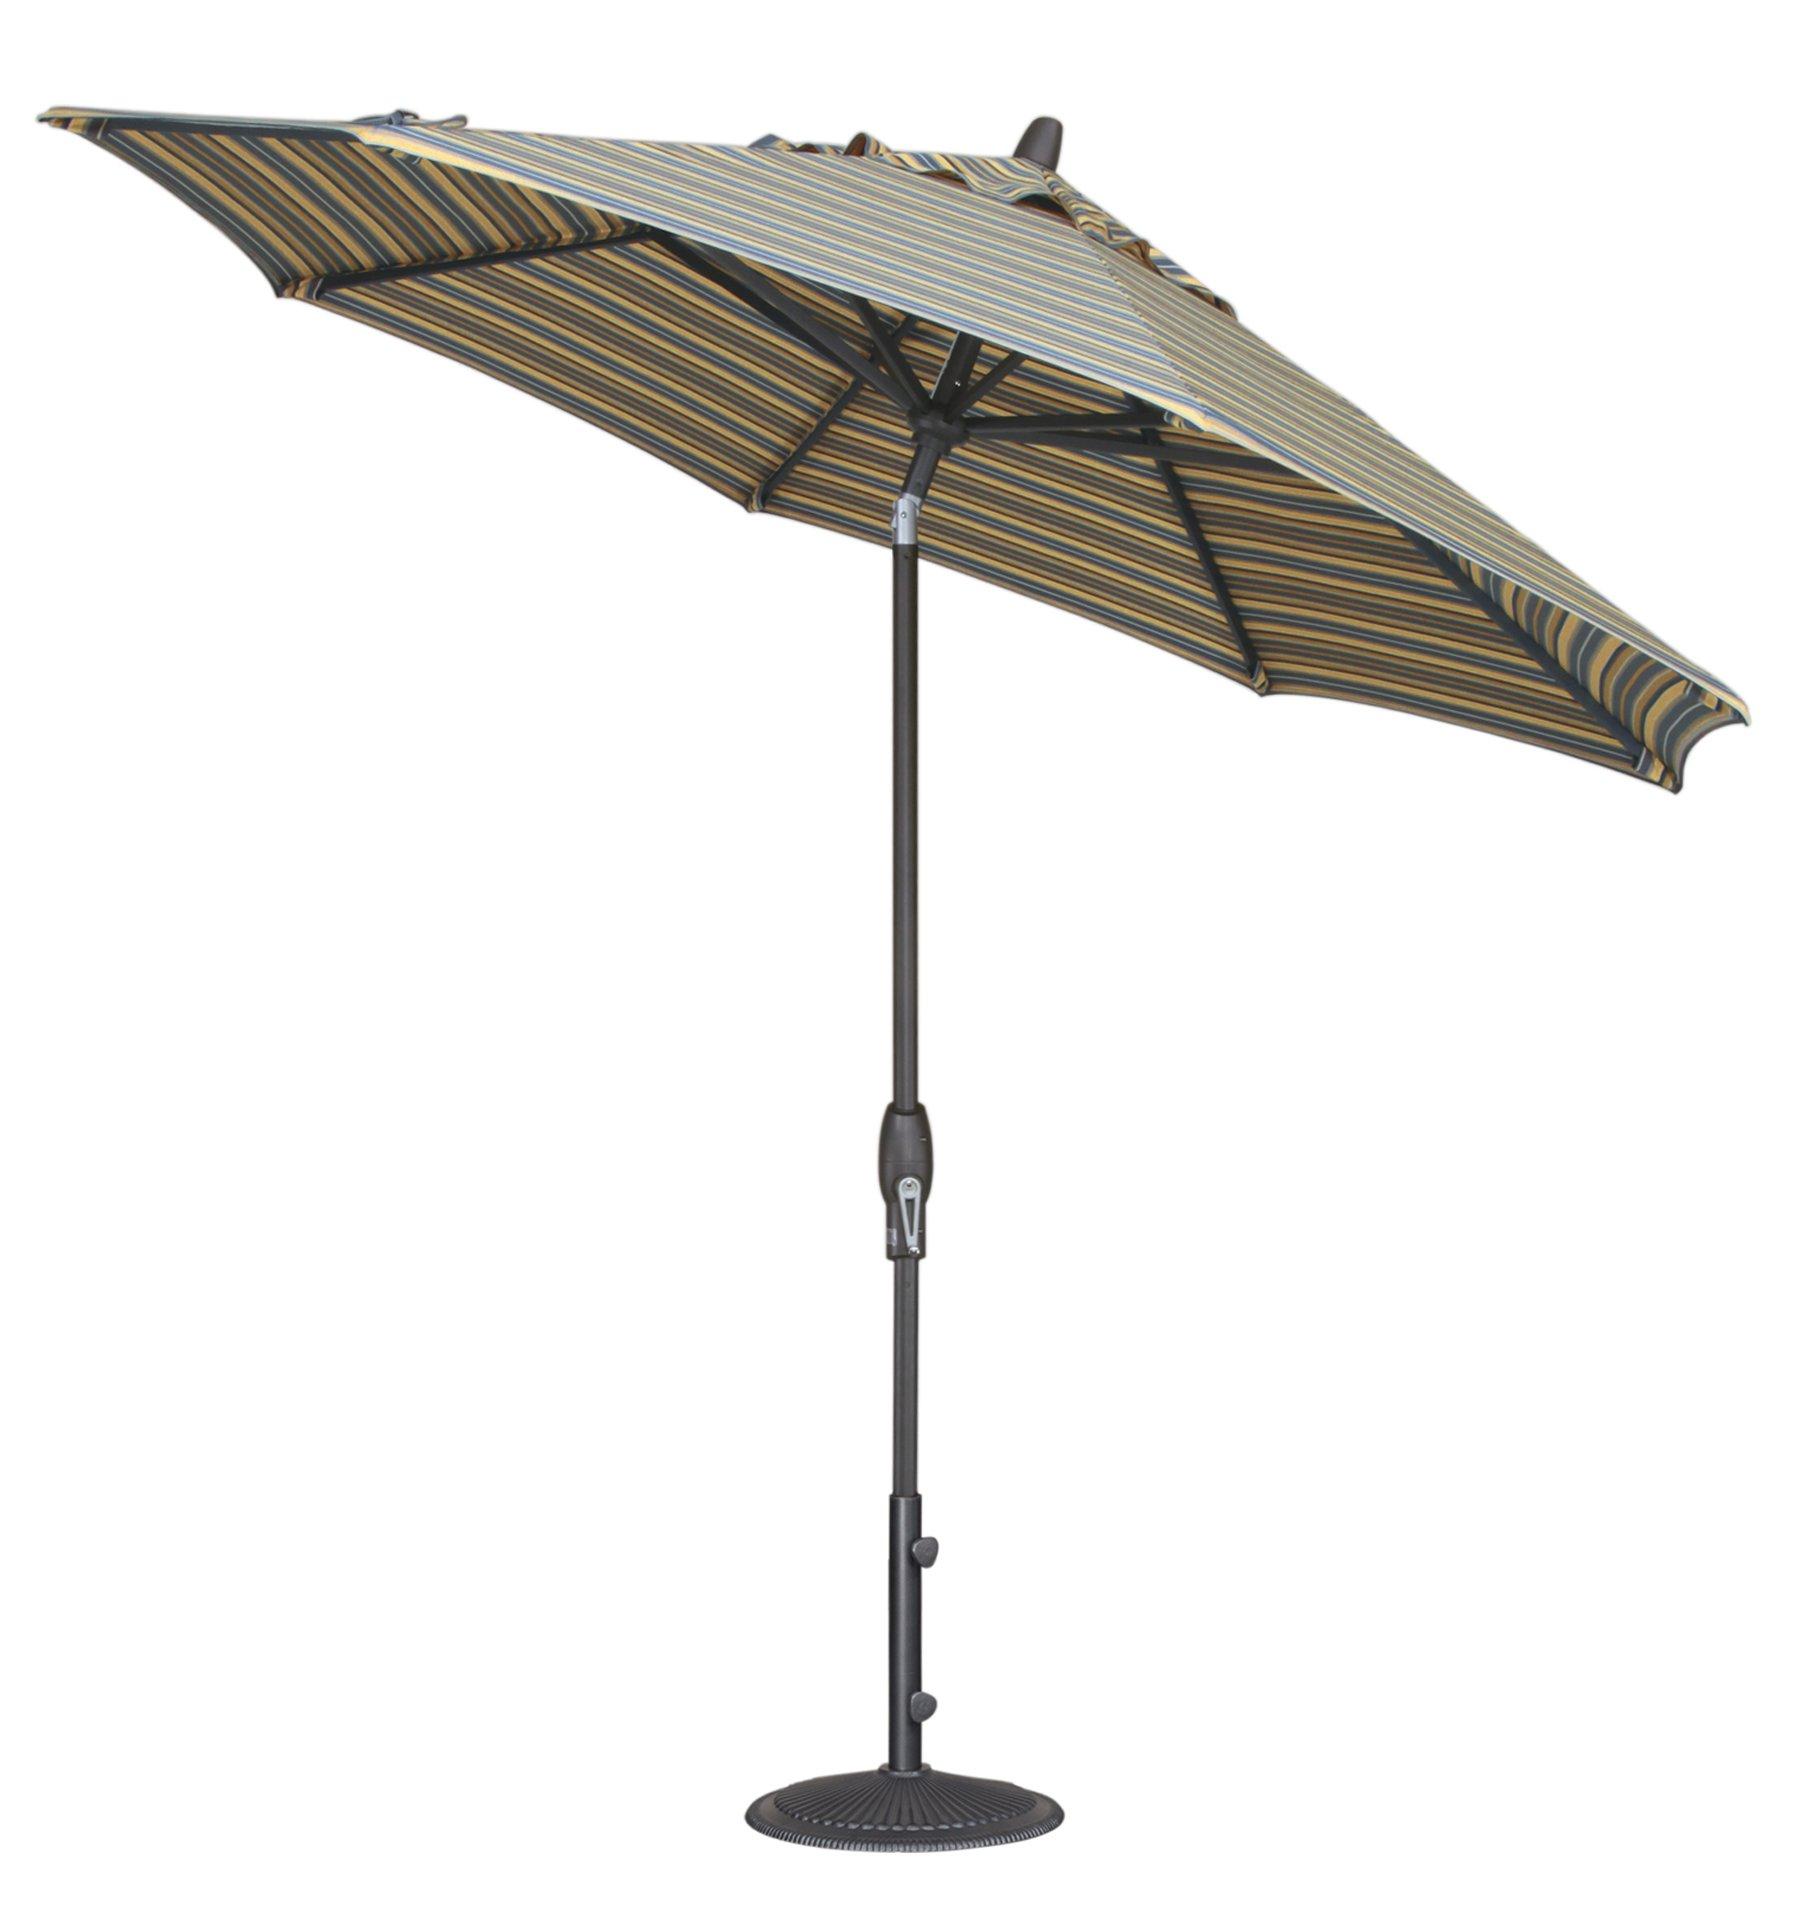 9-Foot Treasure Garden (Model 810) Deluxe Auto-Tilt Market Umbrella with Bronze Frame and Sunbrella Fabric: Canvas (Includes 3 Year Extended Frame Warrantee) by Treasure Garden (Image #4)